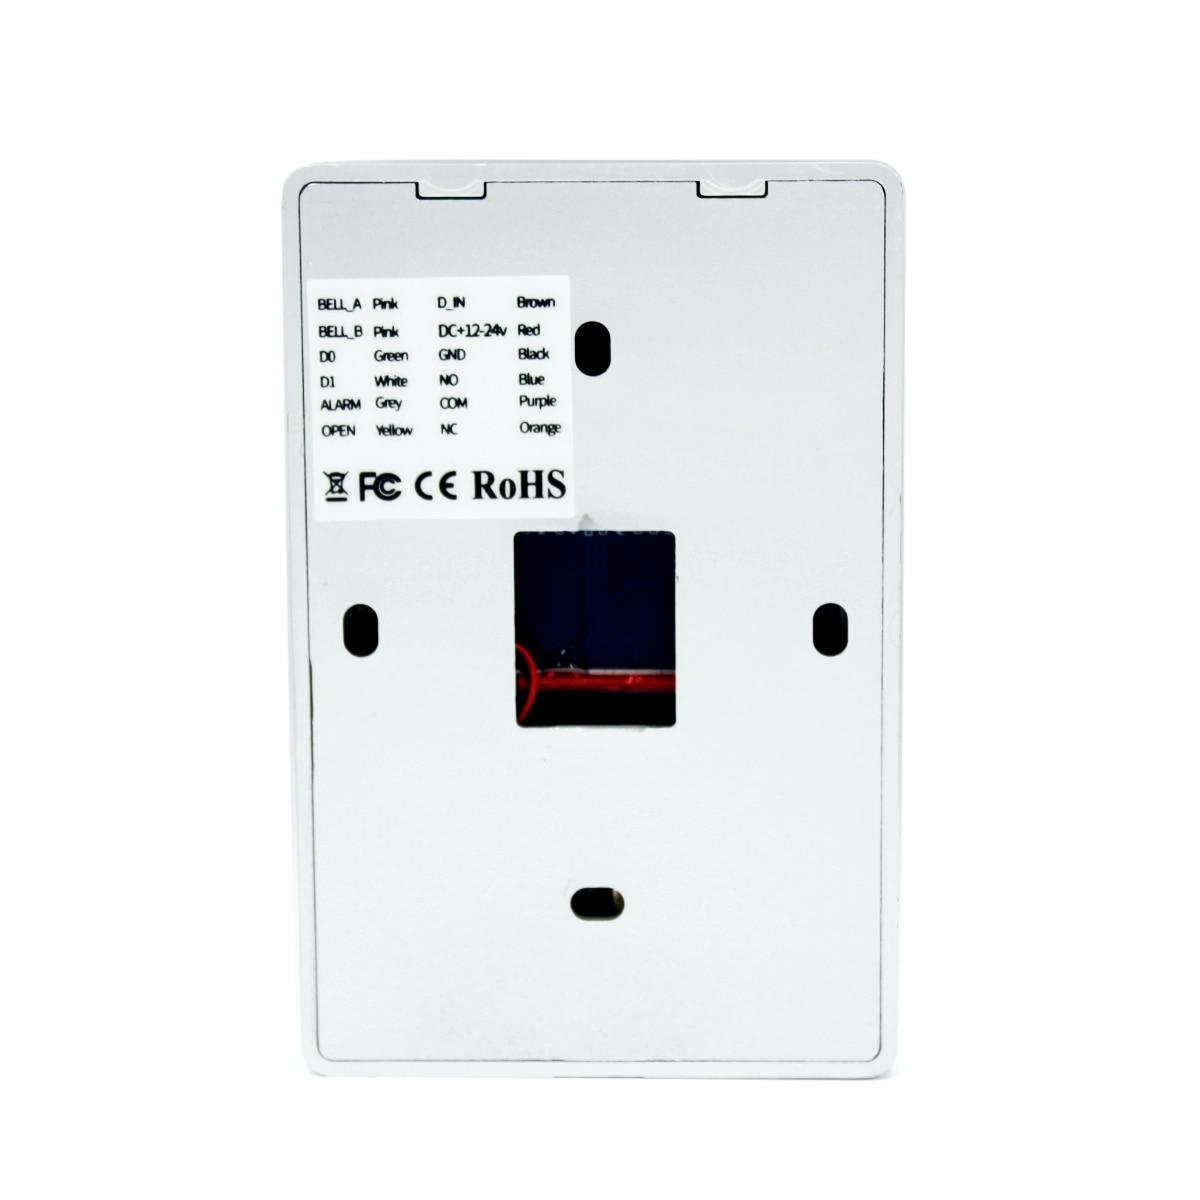 Backlight Touch 125khz RFID Card Access Control keypad EM card reader Door Lock opener wiegand 26 Backlight Touch 125khz RFID Card Access Control keypad EM card reader Door Lock opener wiegand 26 output Anti-disassembly Alarm